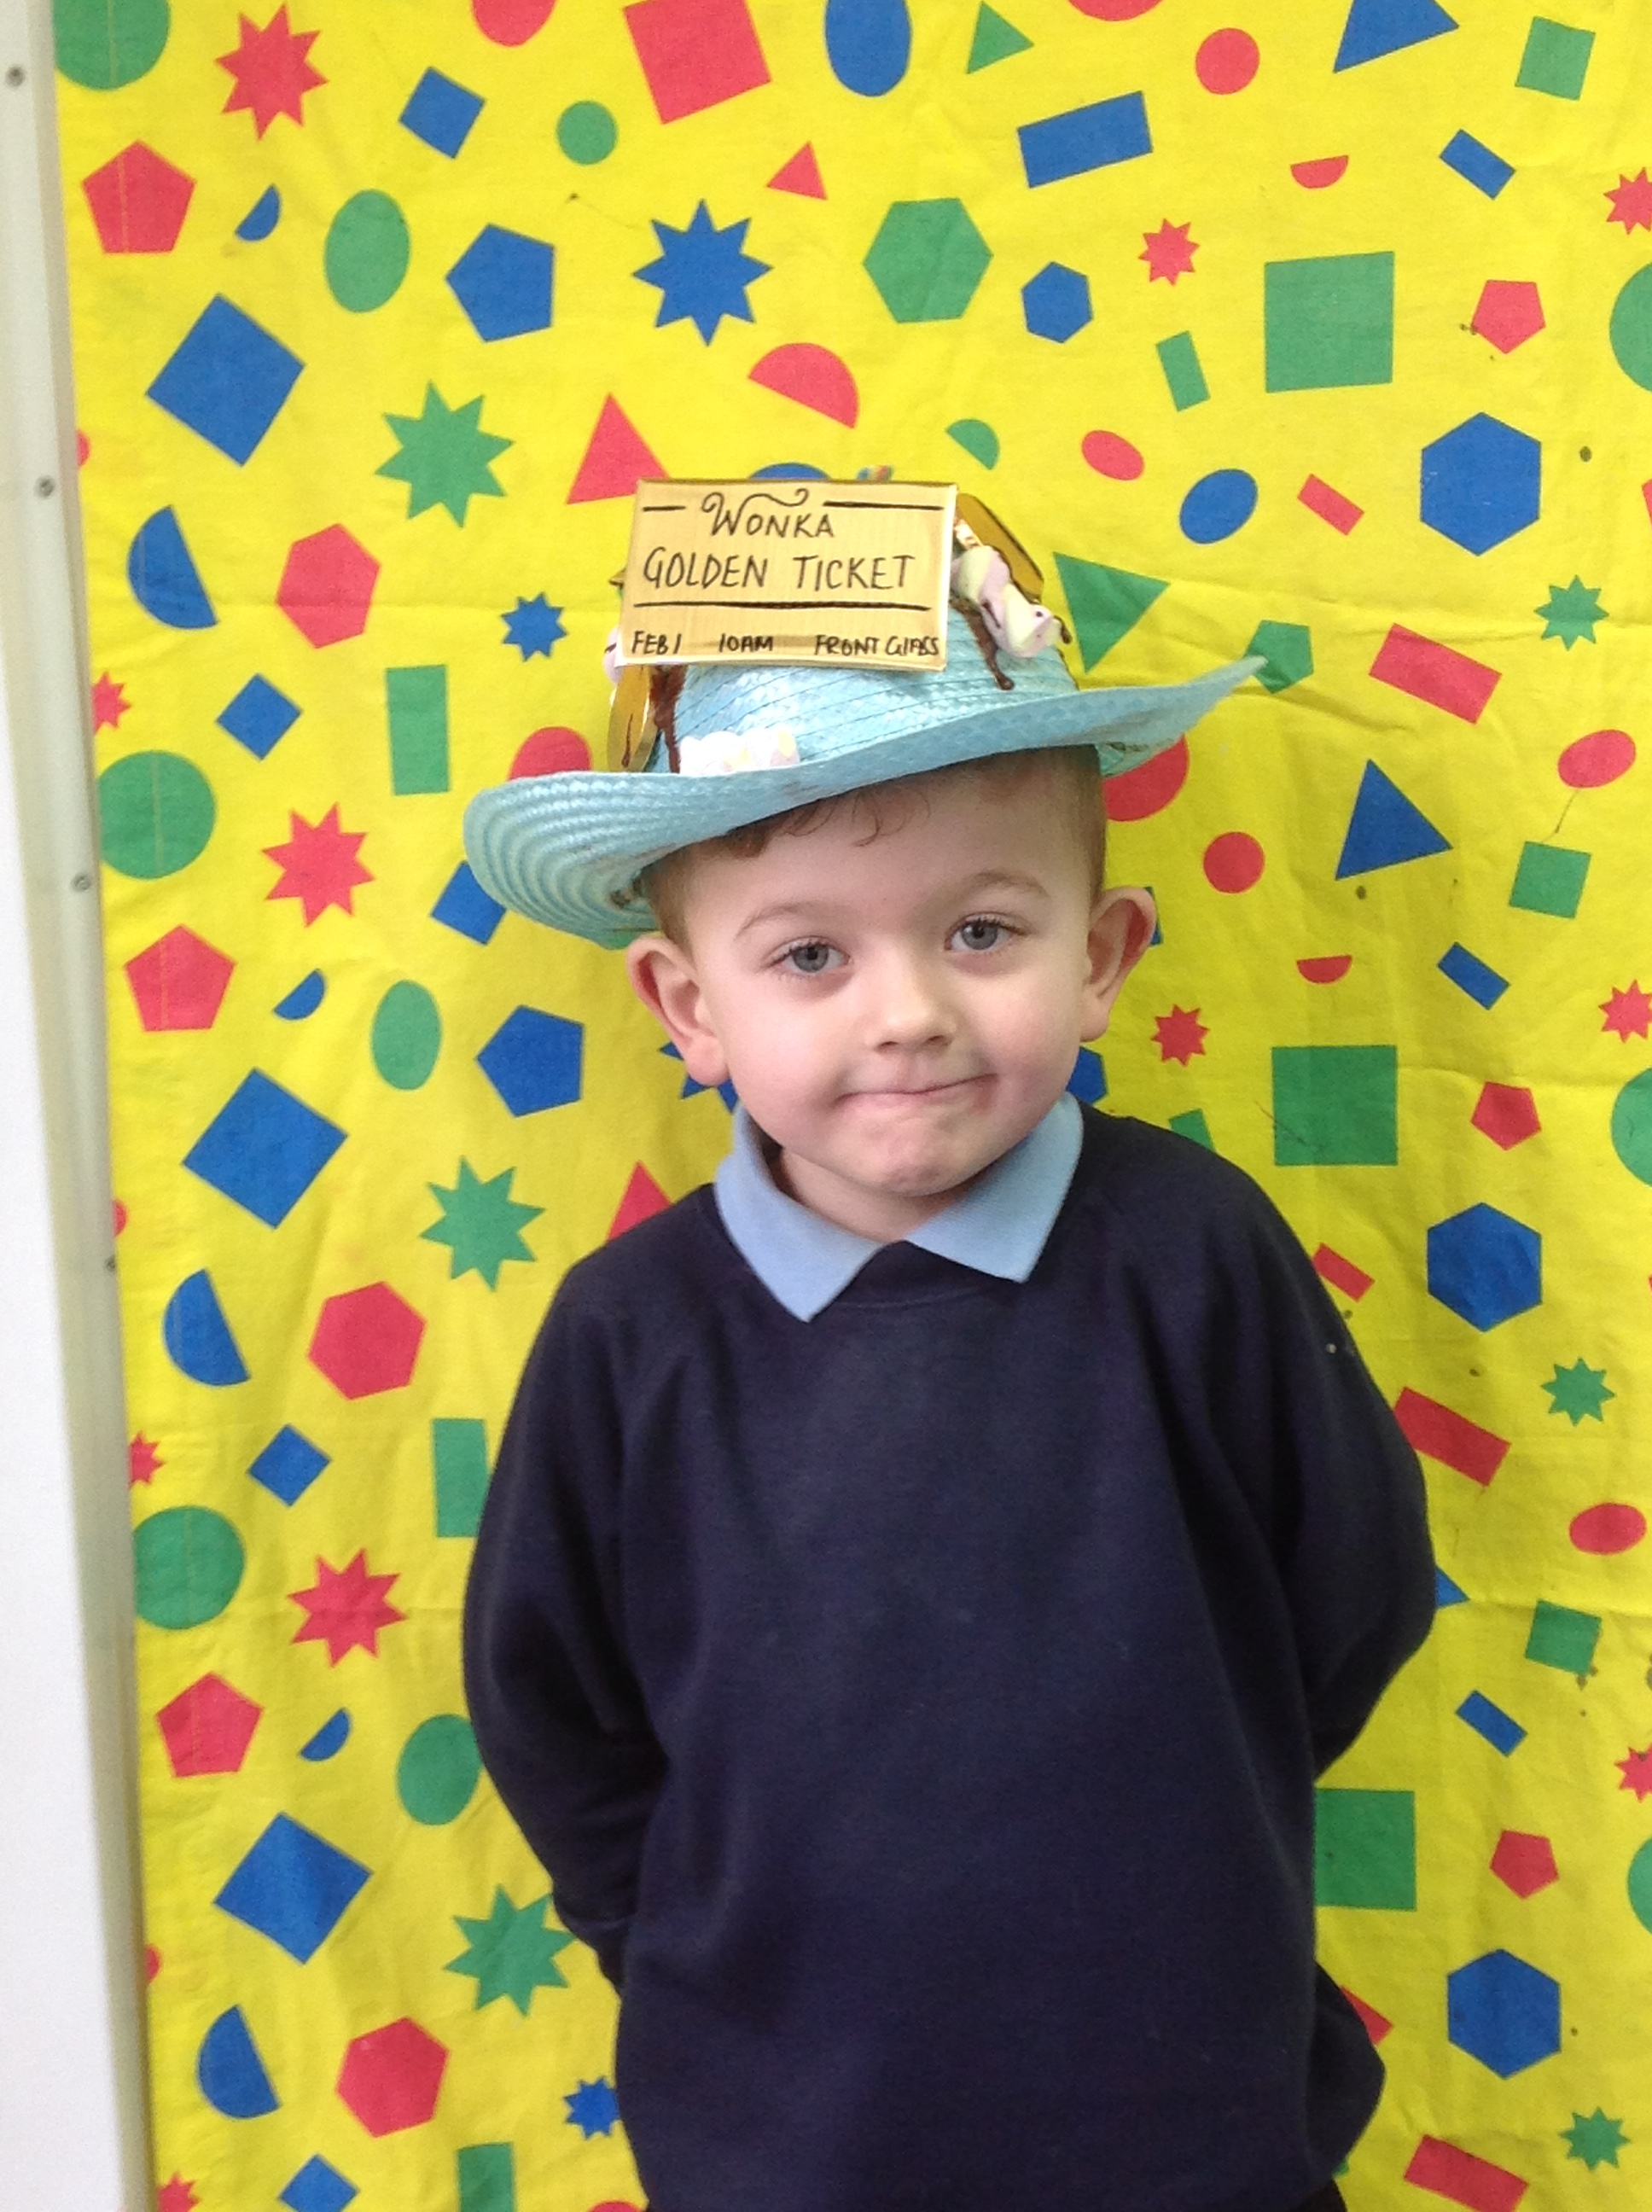 Foundation Stage 1 - Mersey Park Primary School